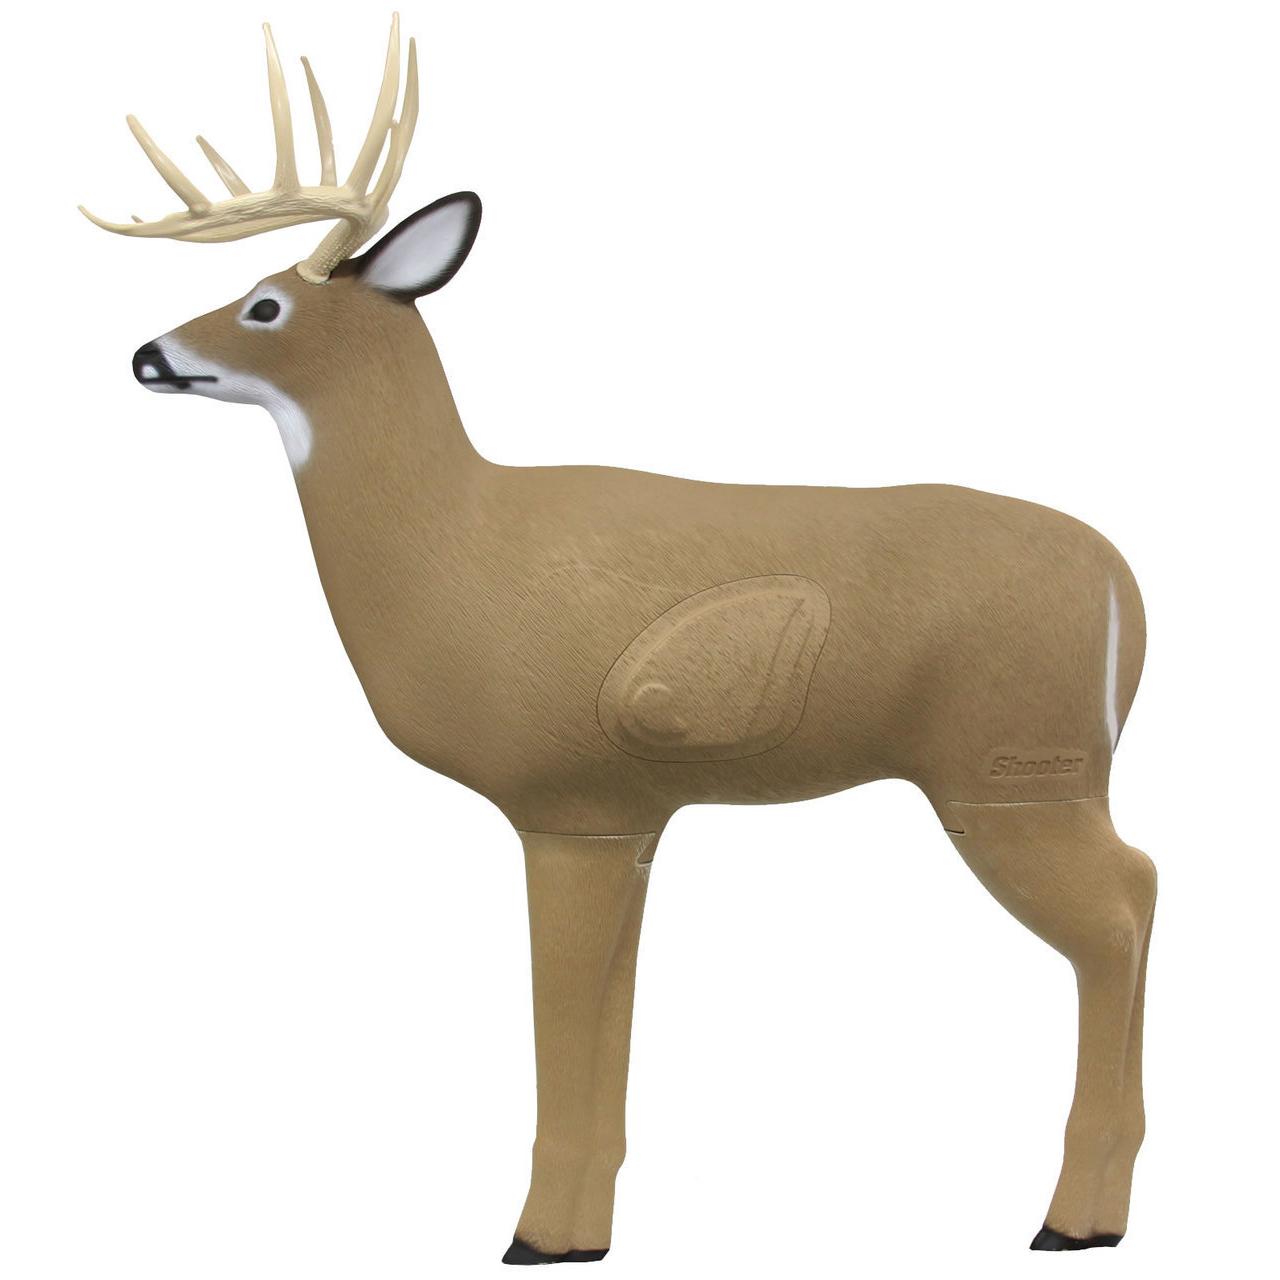 Big Shooter Buck 3-D Archery Target thumbnail